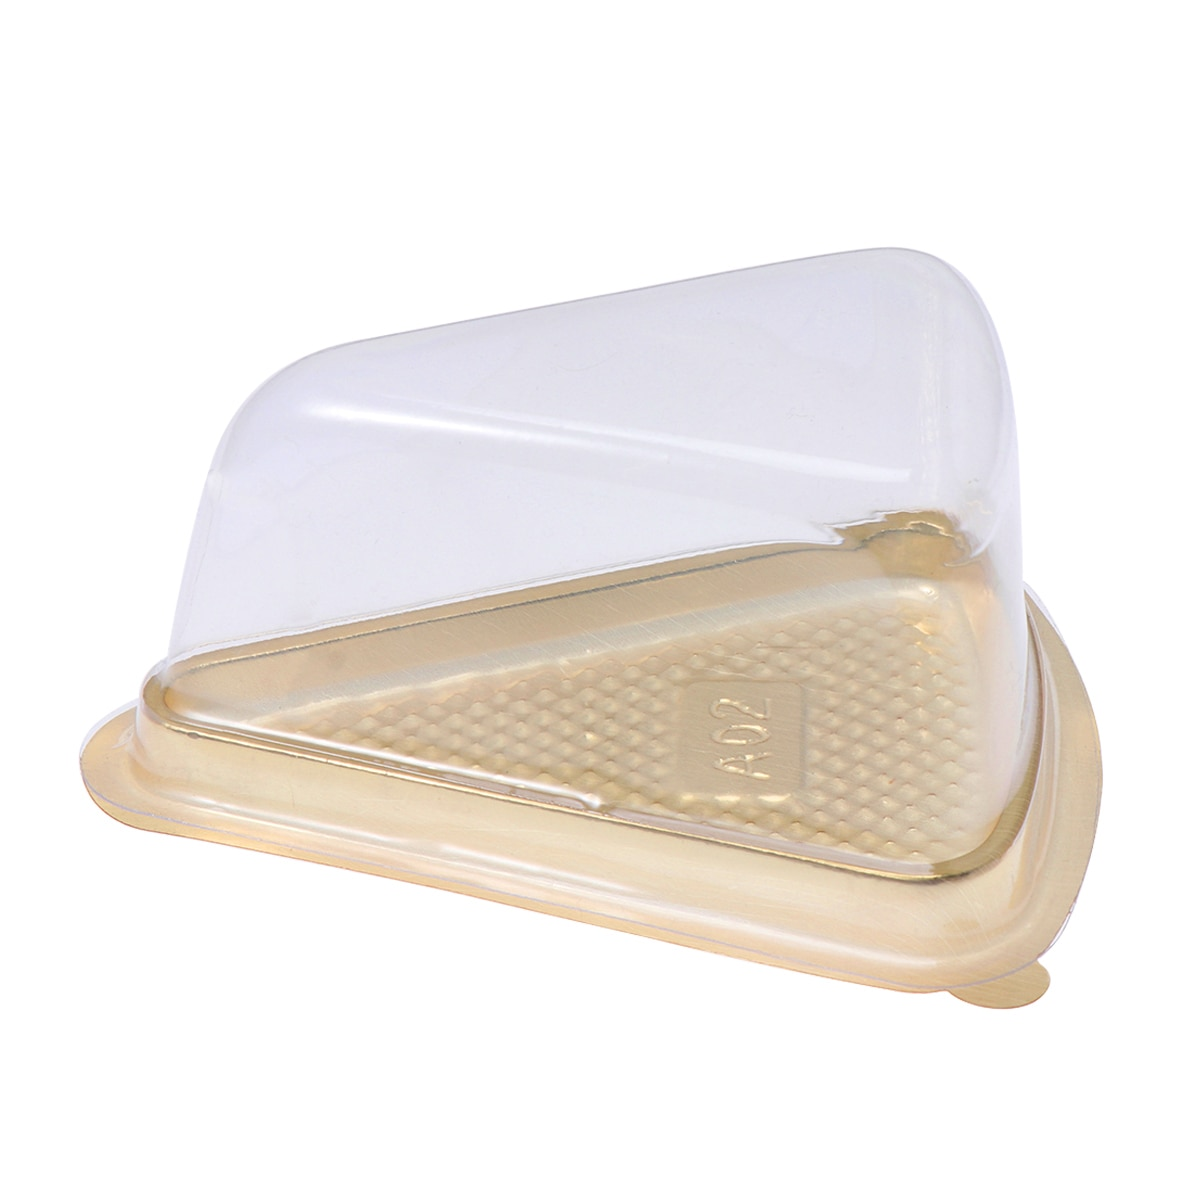 Caixas de empacotamento descartáveis do presente dos recipientes de alimento do cakecup da bandeja do bolo da lua do triângulo de 50 pces